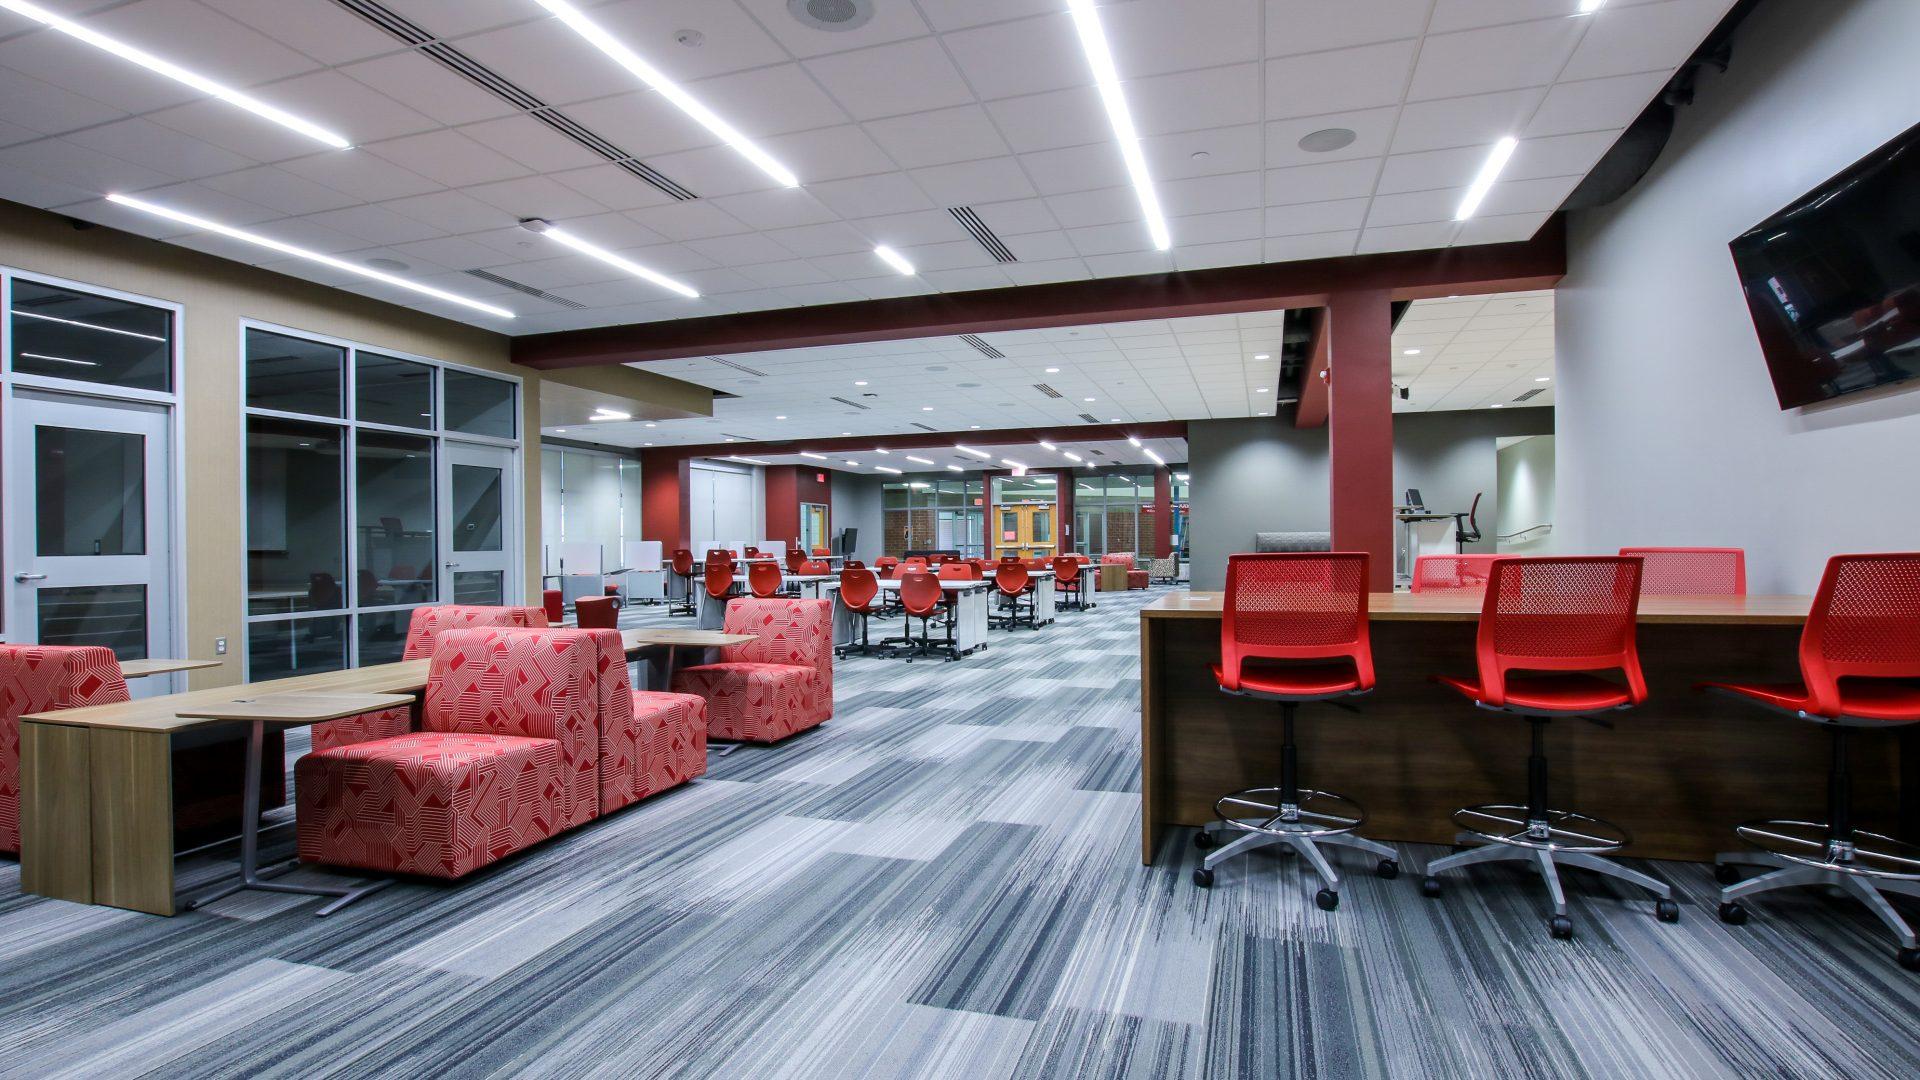 Kentwood Public Schools Collaboration Center